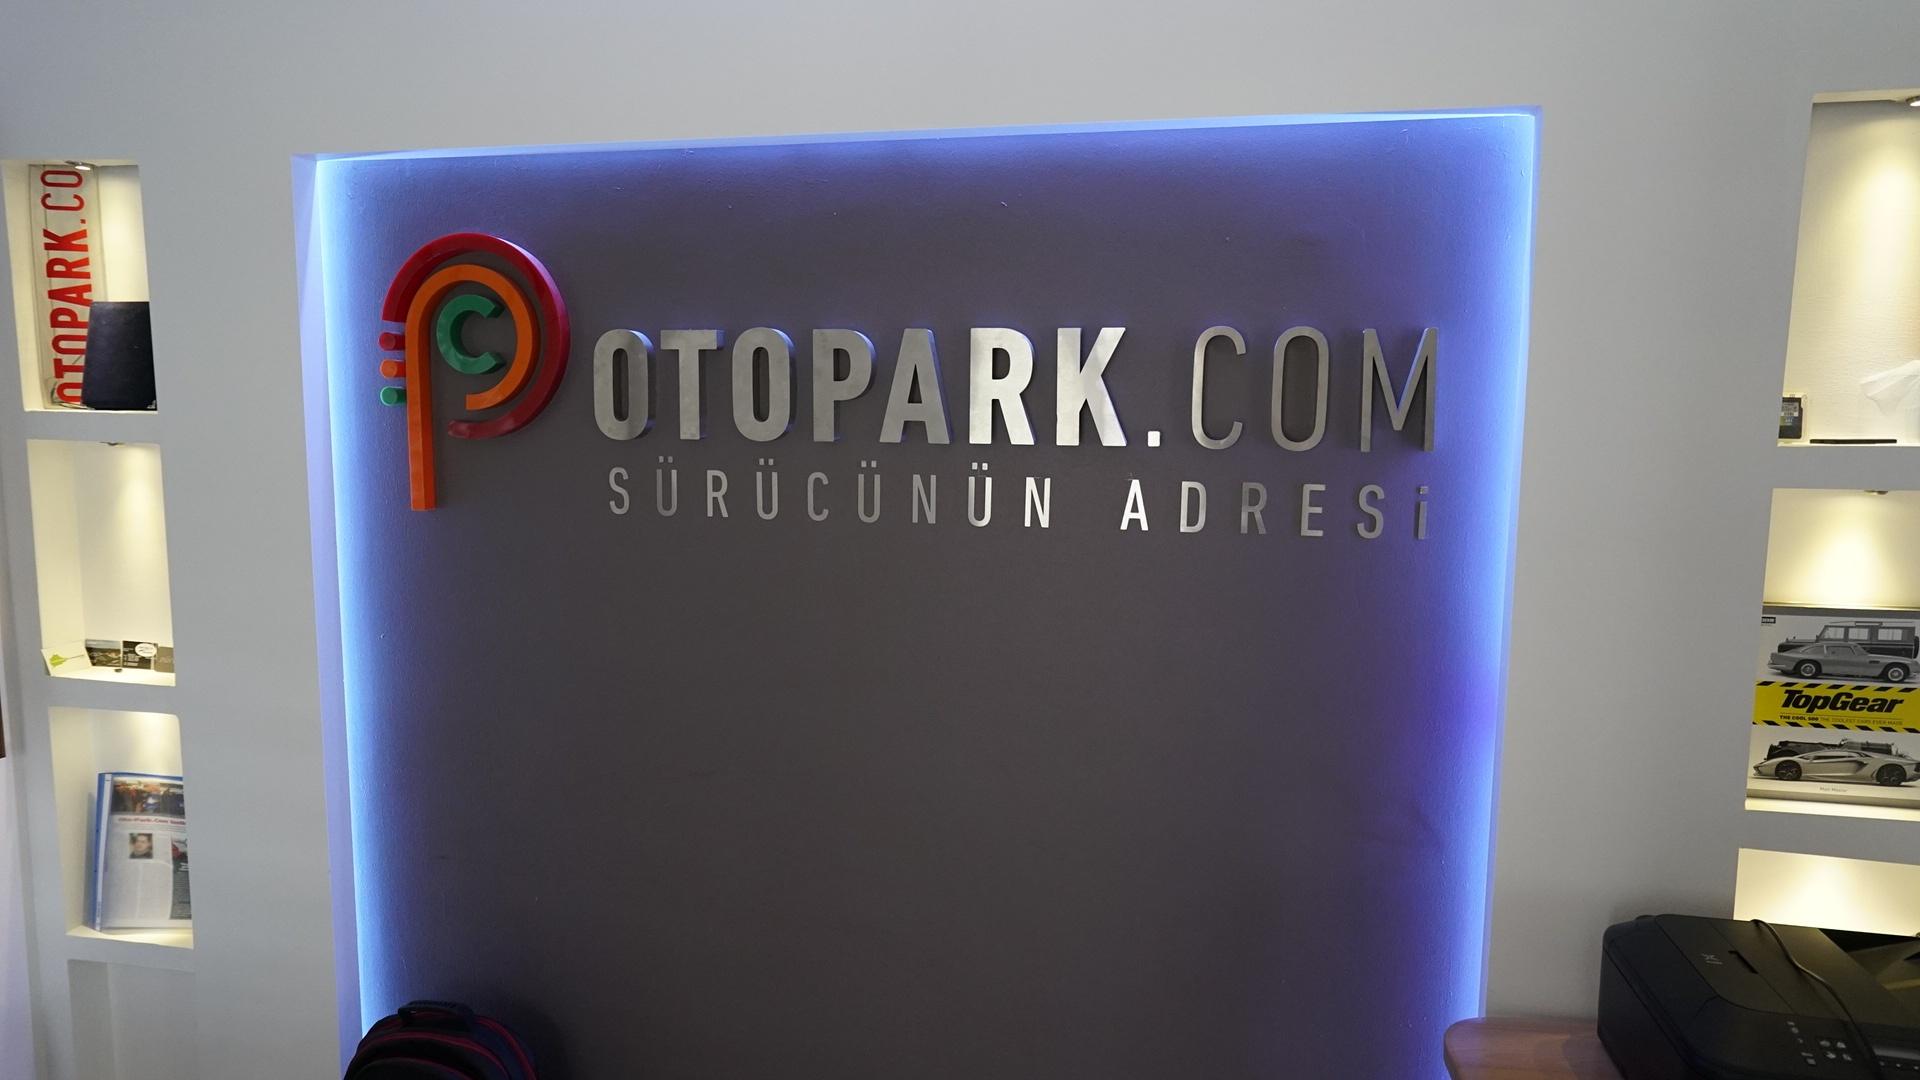 Photo of OTOPARKCOM v2